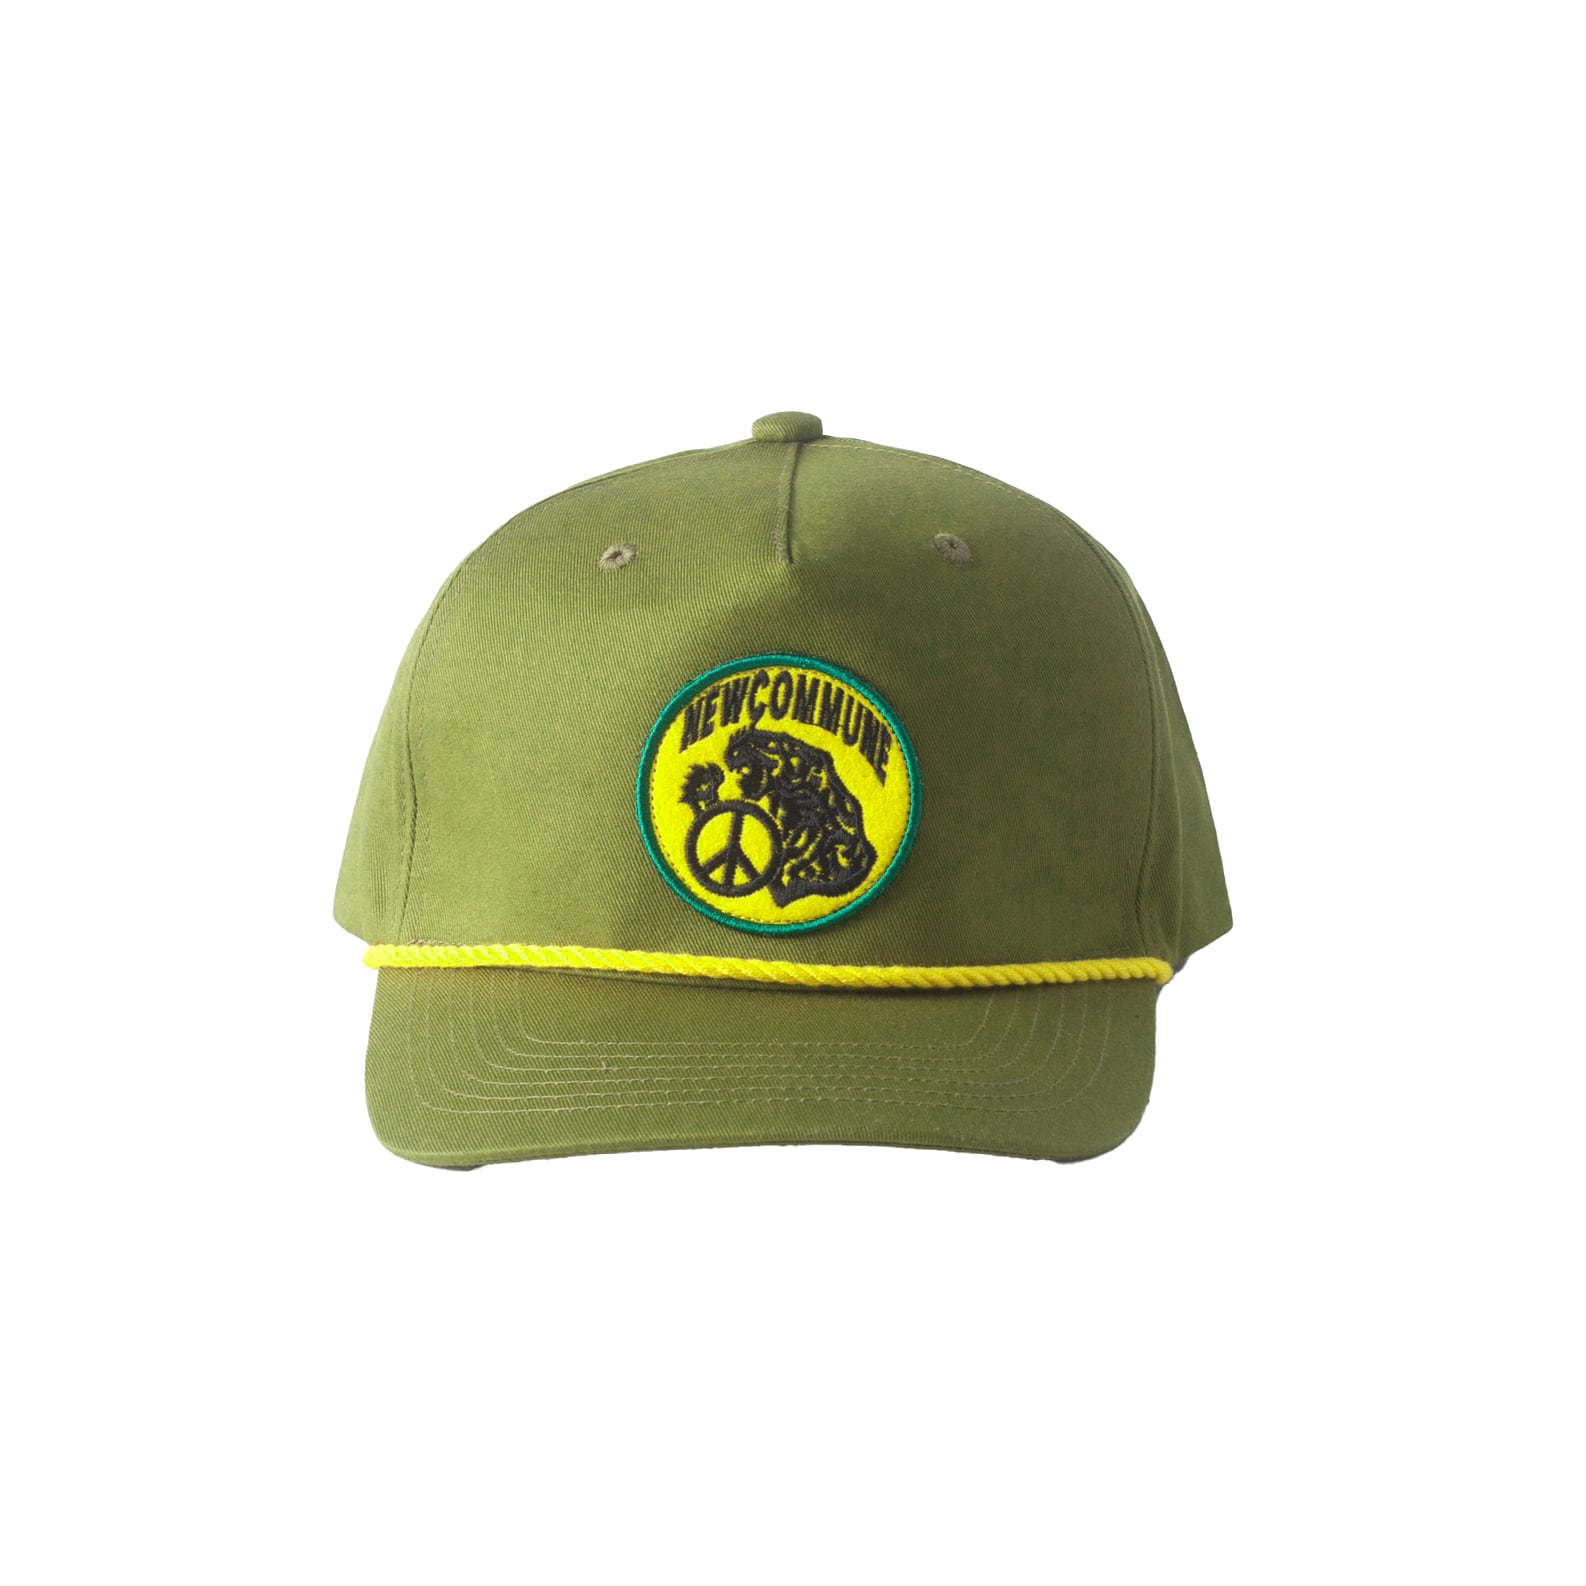 NEW COMMUNE 5 PANEL CAP / GREEN - 画像2